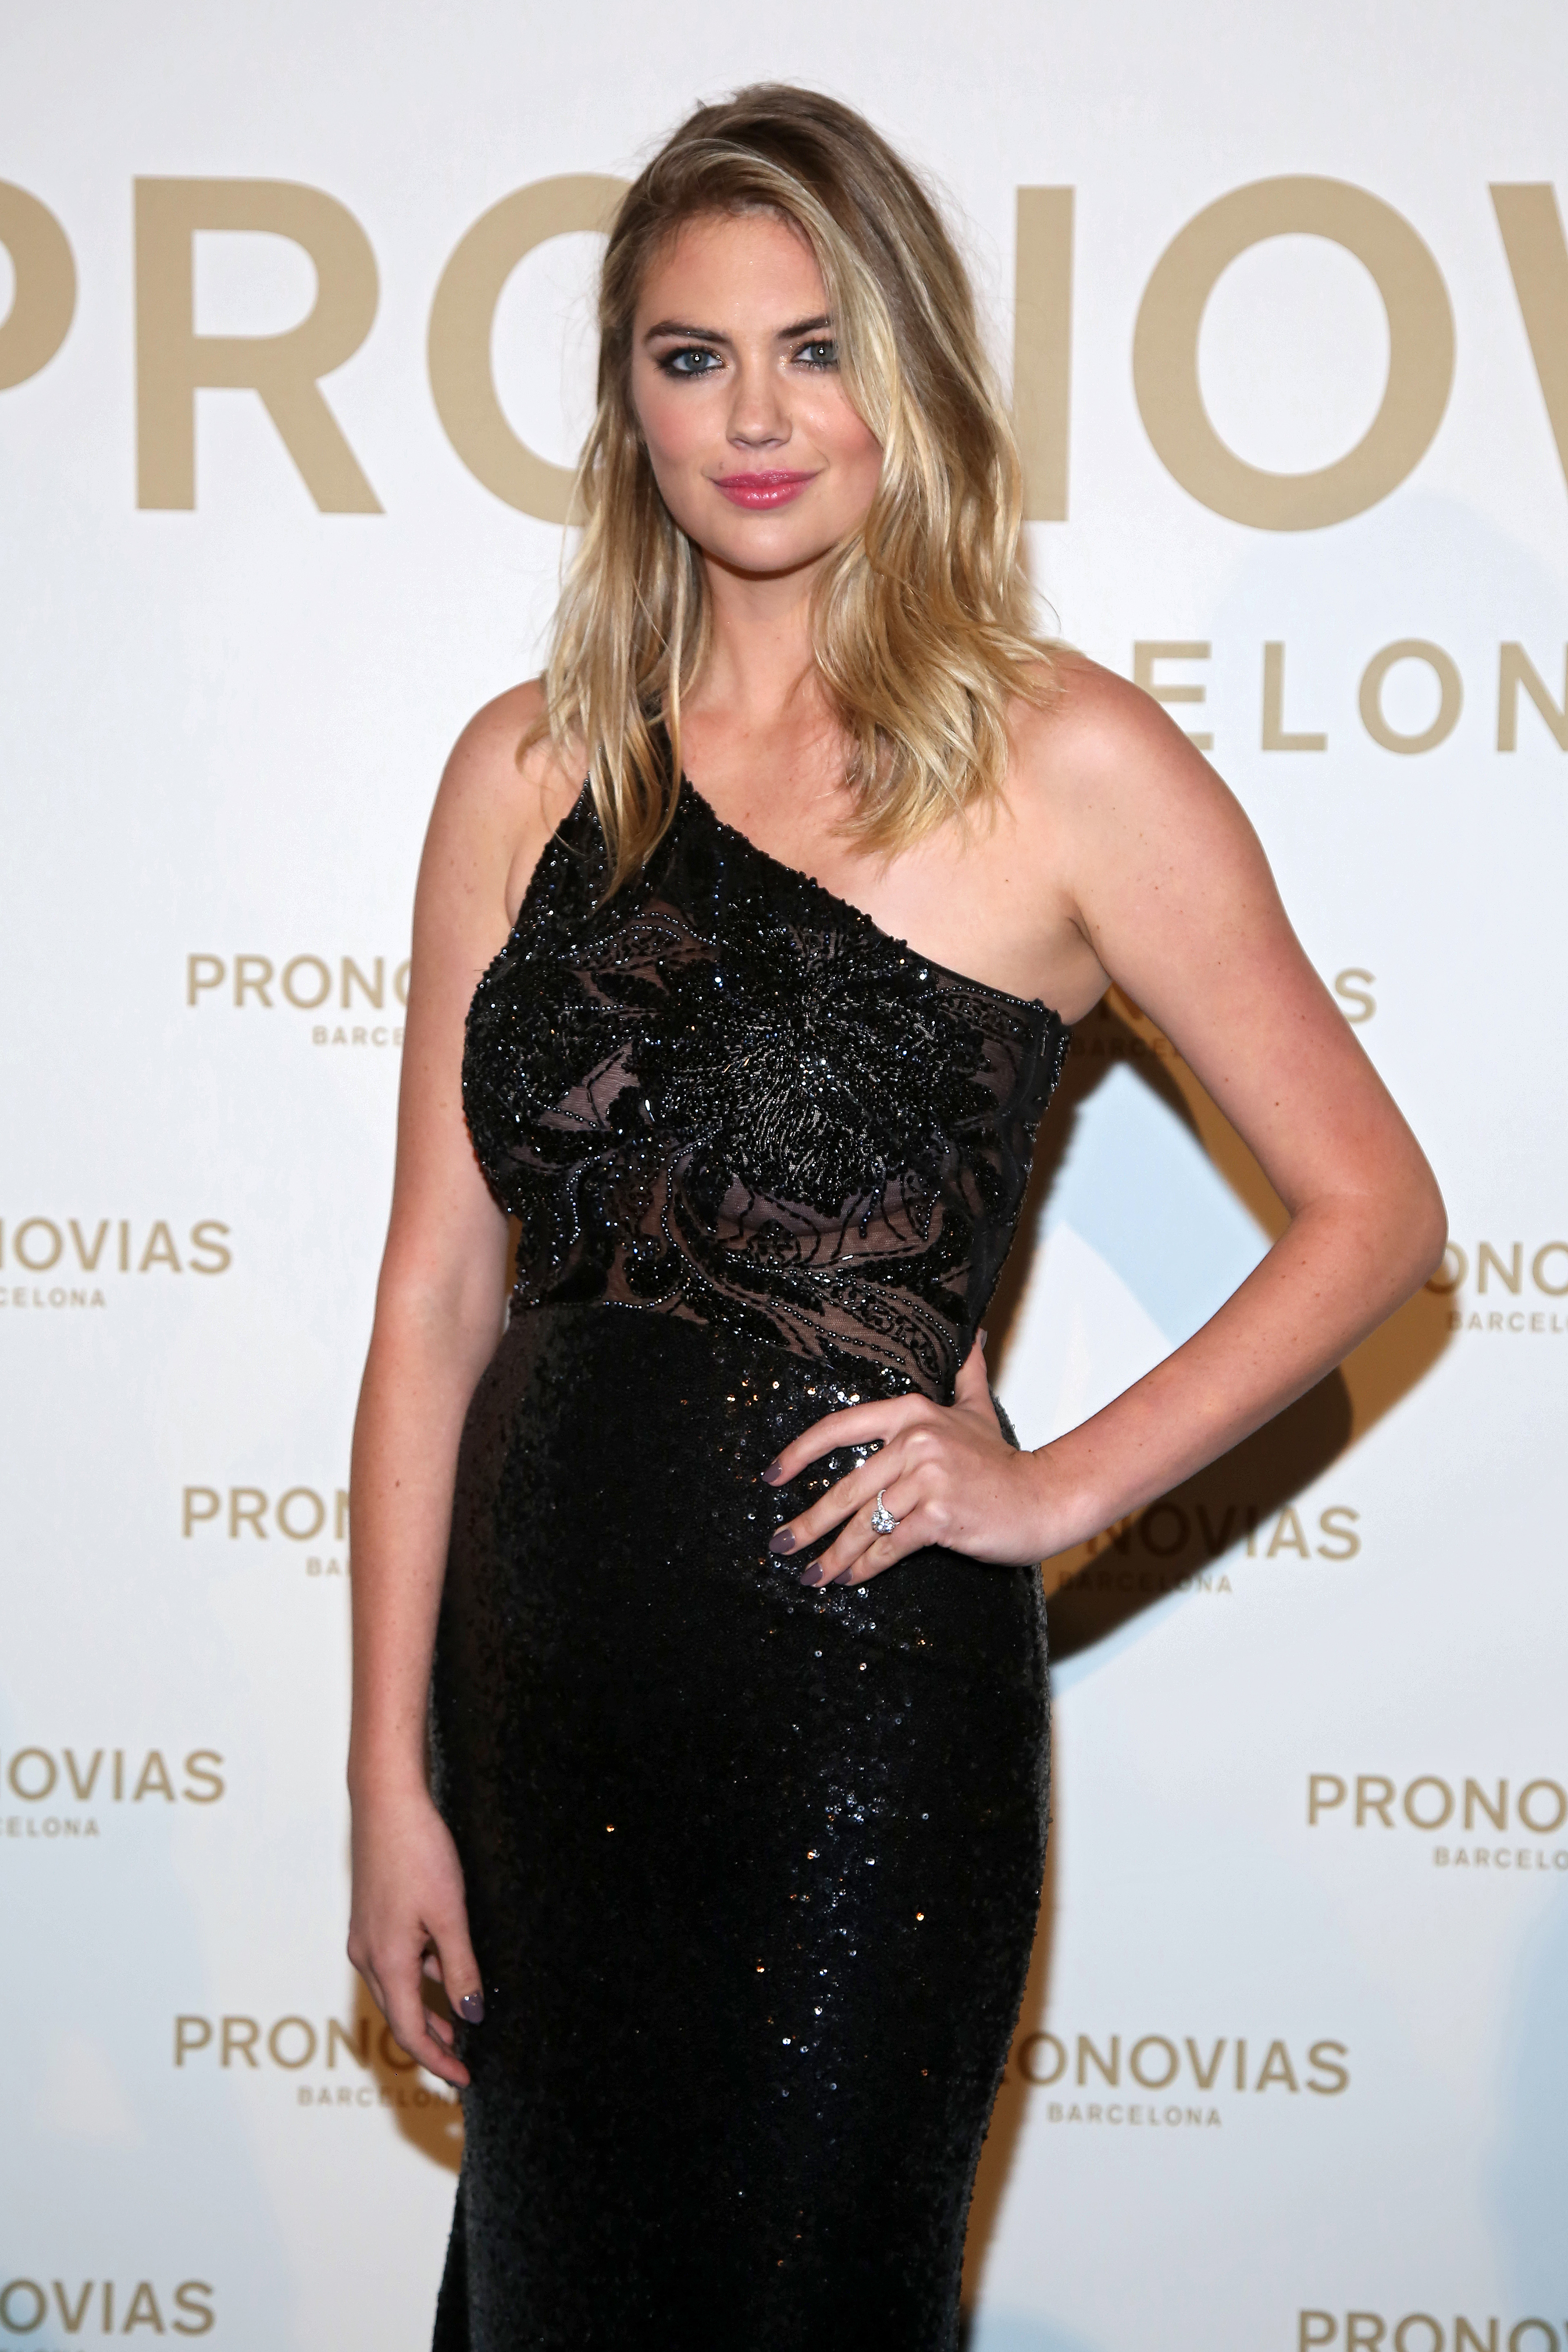 Kate Upton at Pronovias Spring 2018 Show Talks Wedding Planning